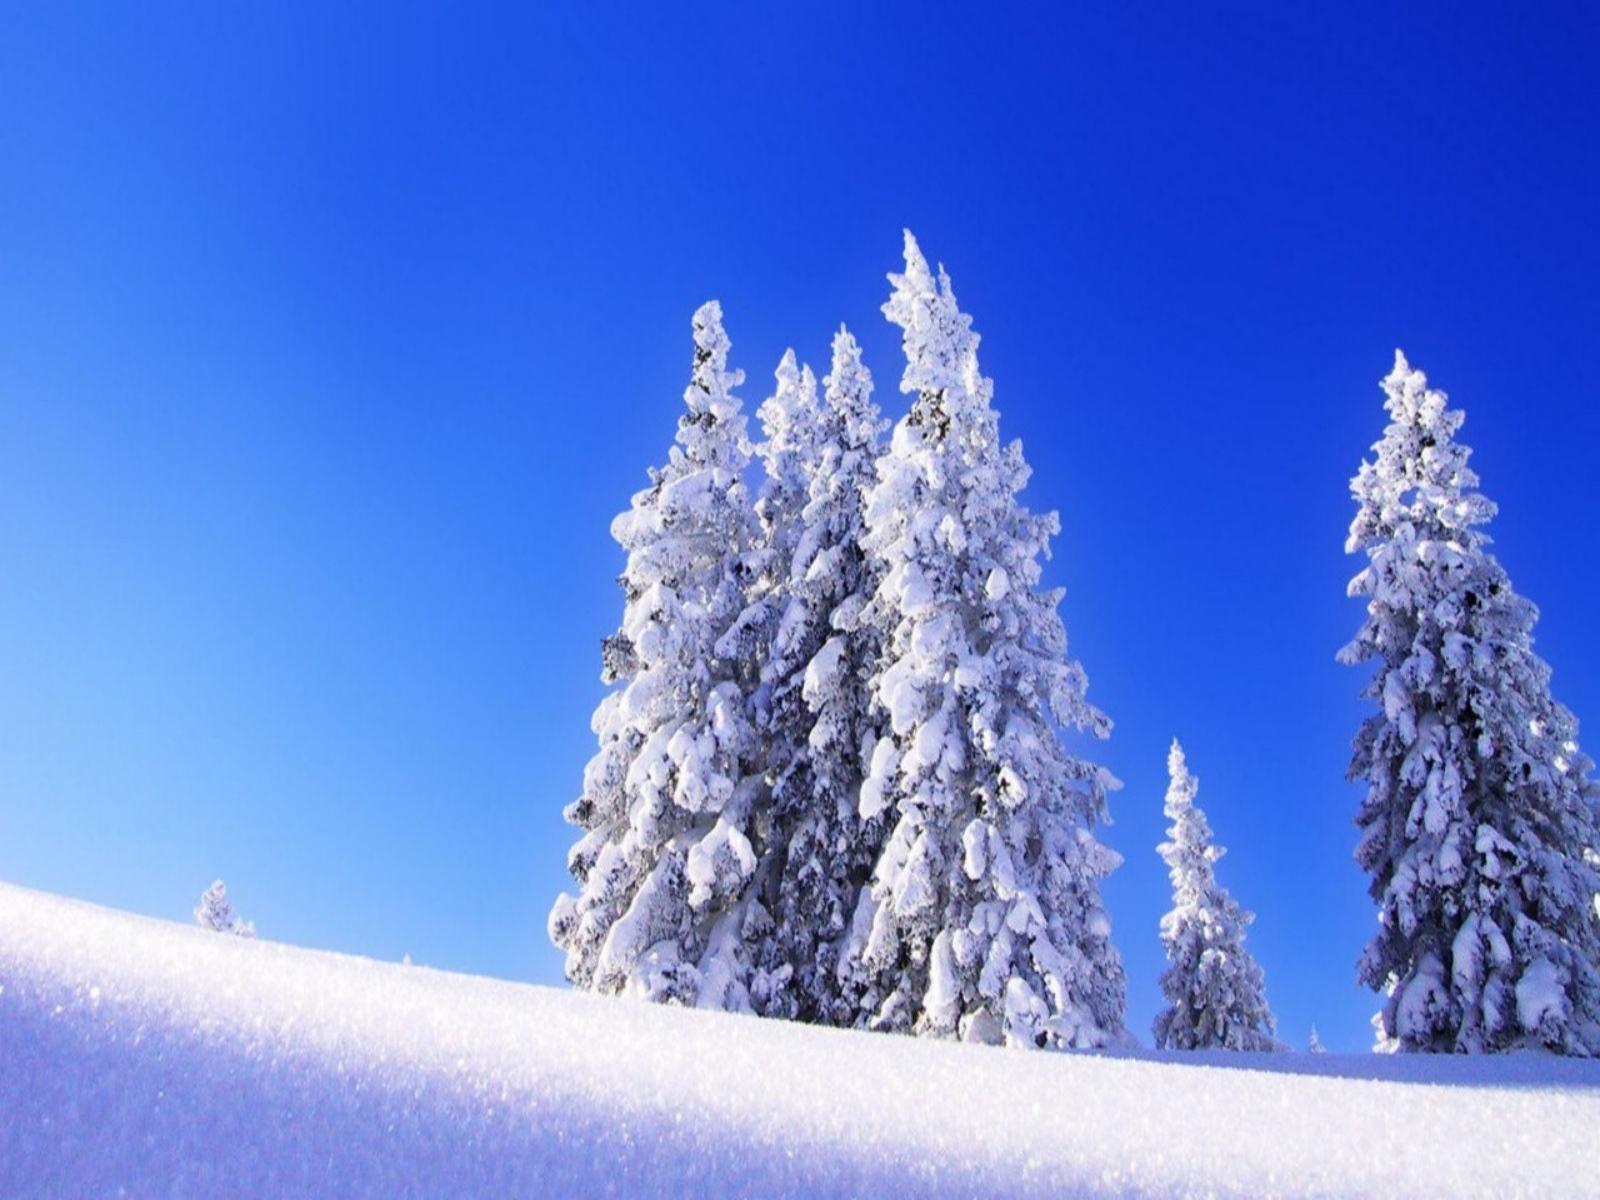 Winter Holiday Wallpaper